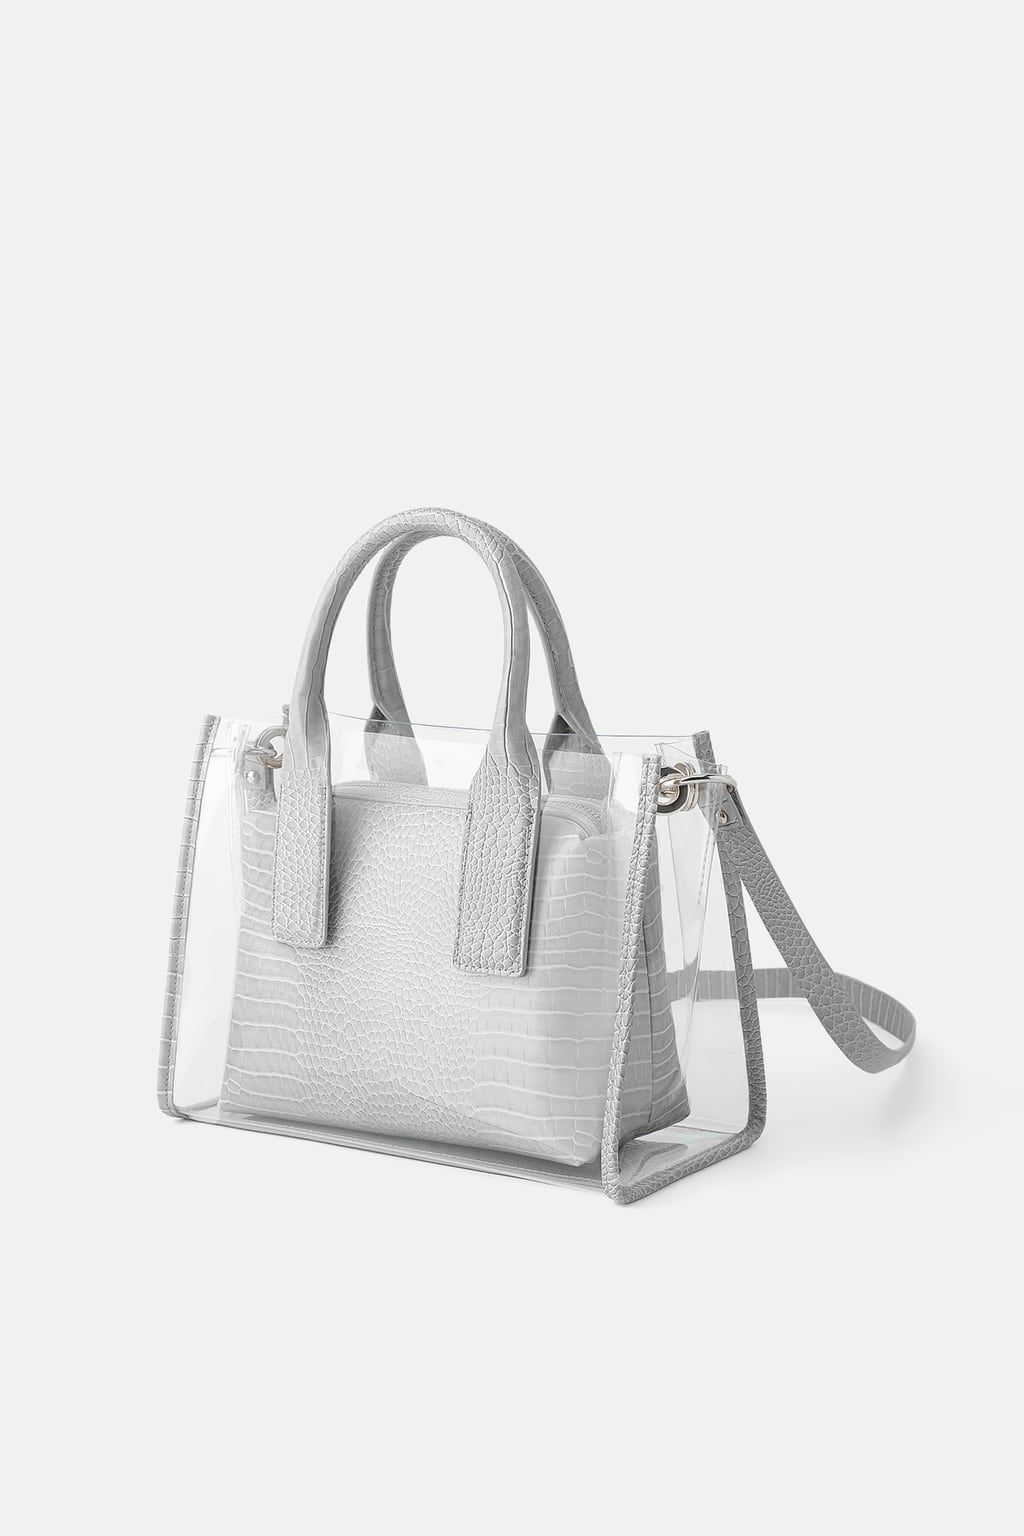 c71d0b357164 Animal print vinyl city bag in 2019 | Zara | City bag, Bags, Animals